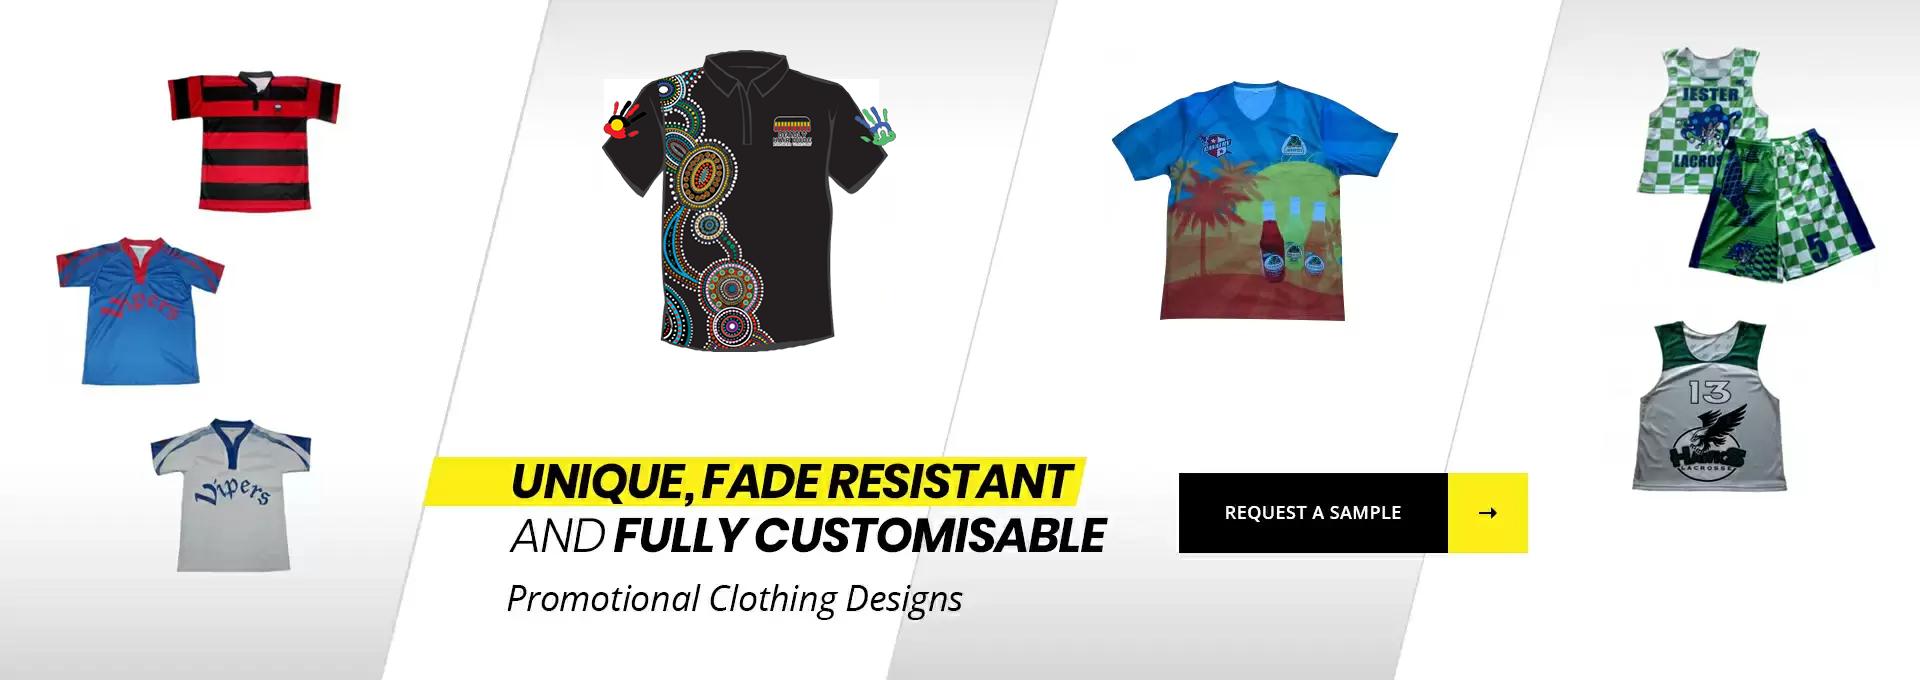 Custom Design Clothing | Promotional clothing designs